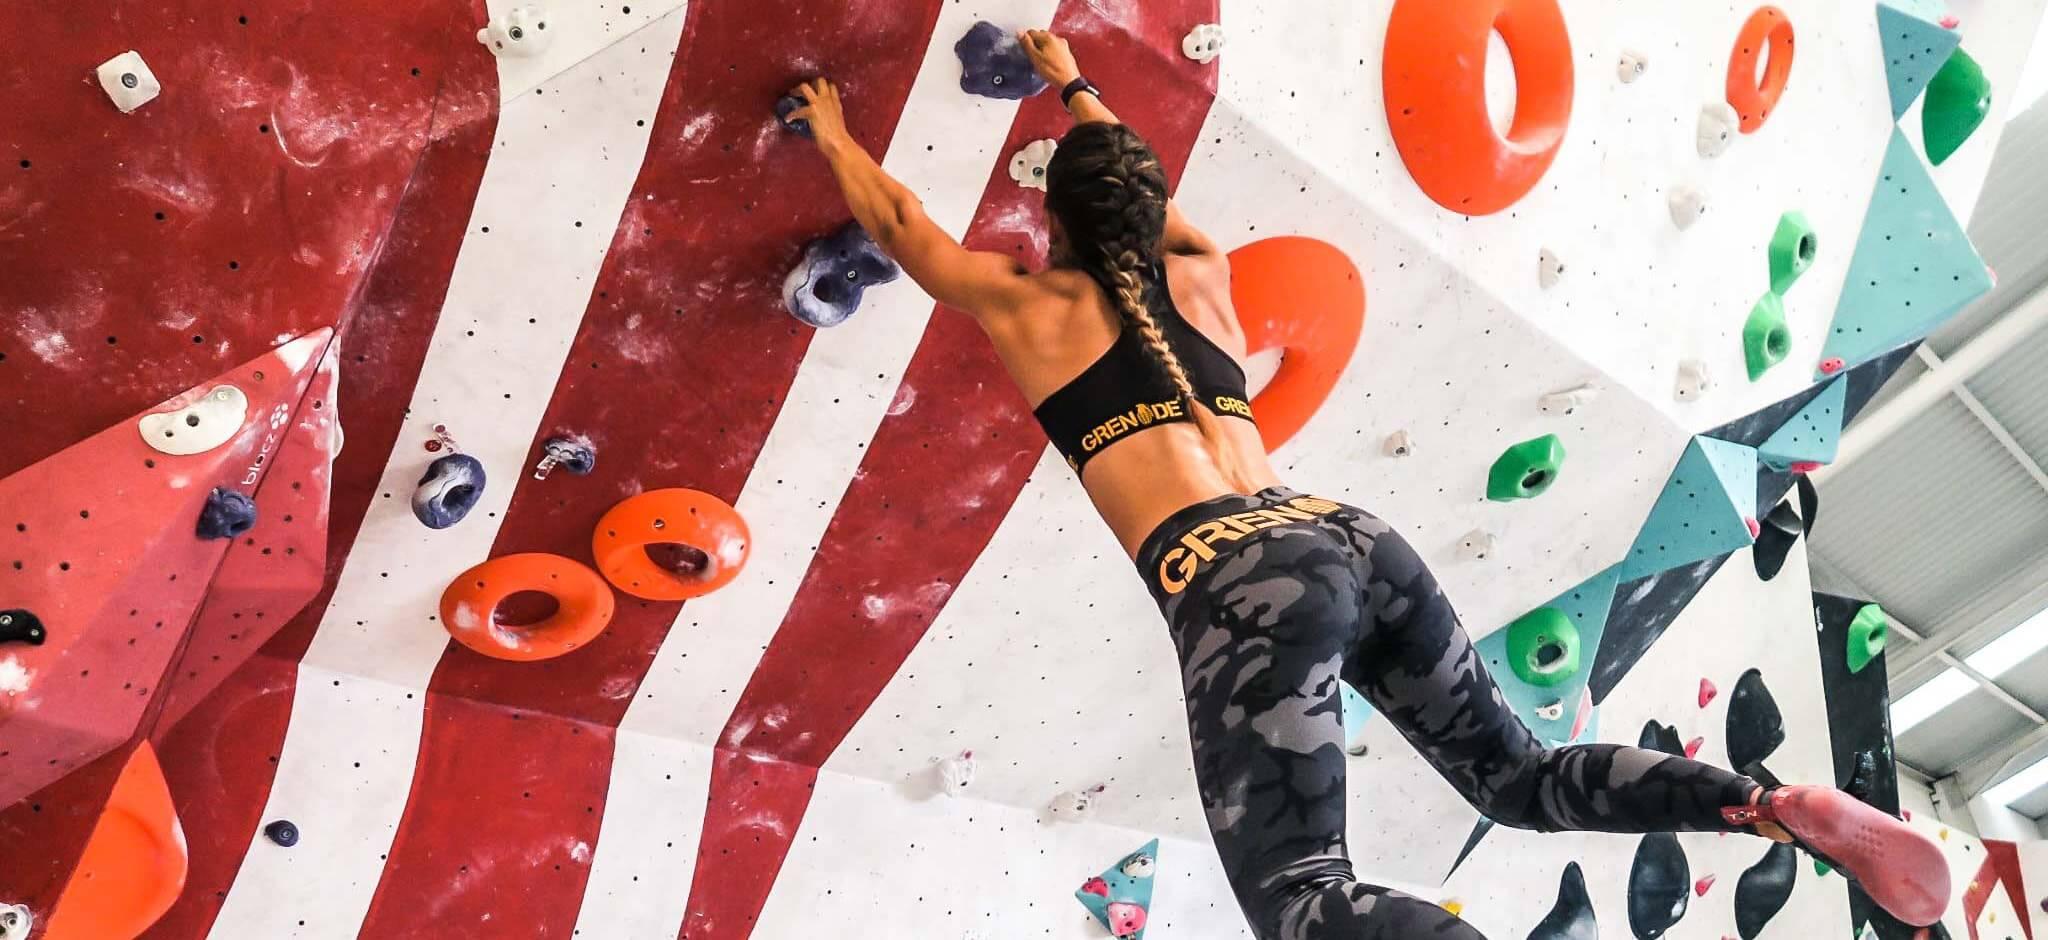 Hayley Madigan climbing